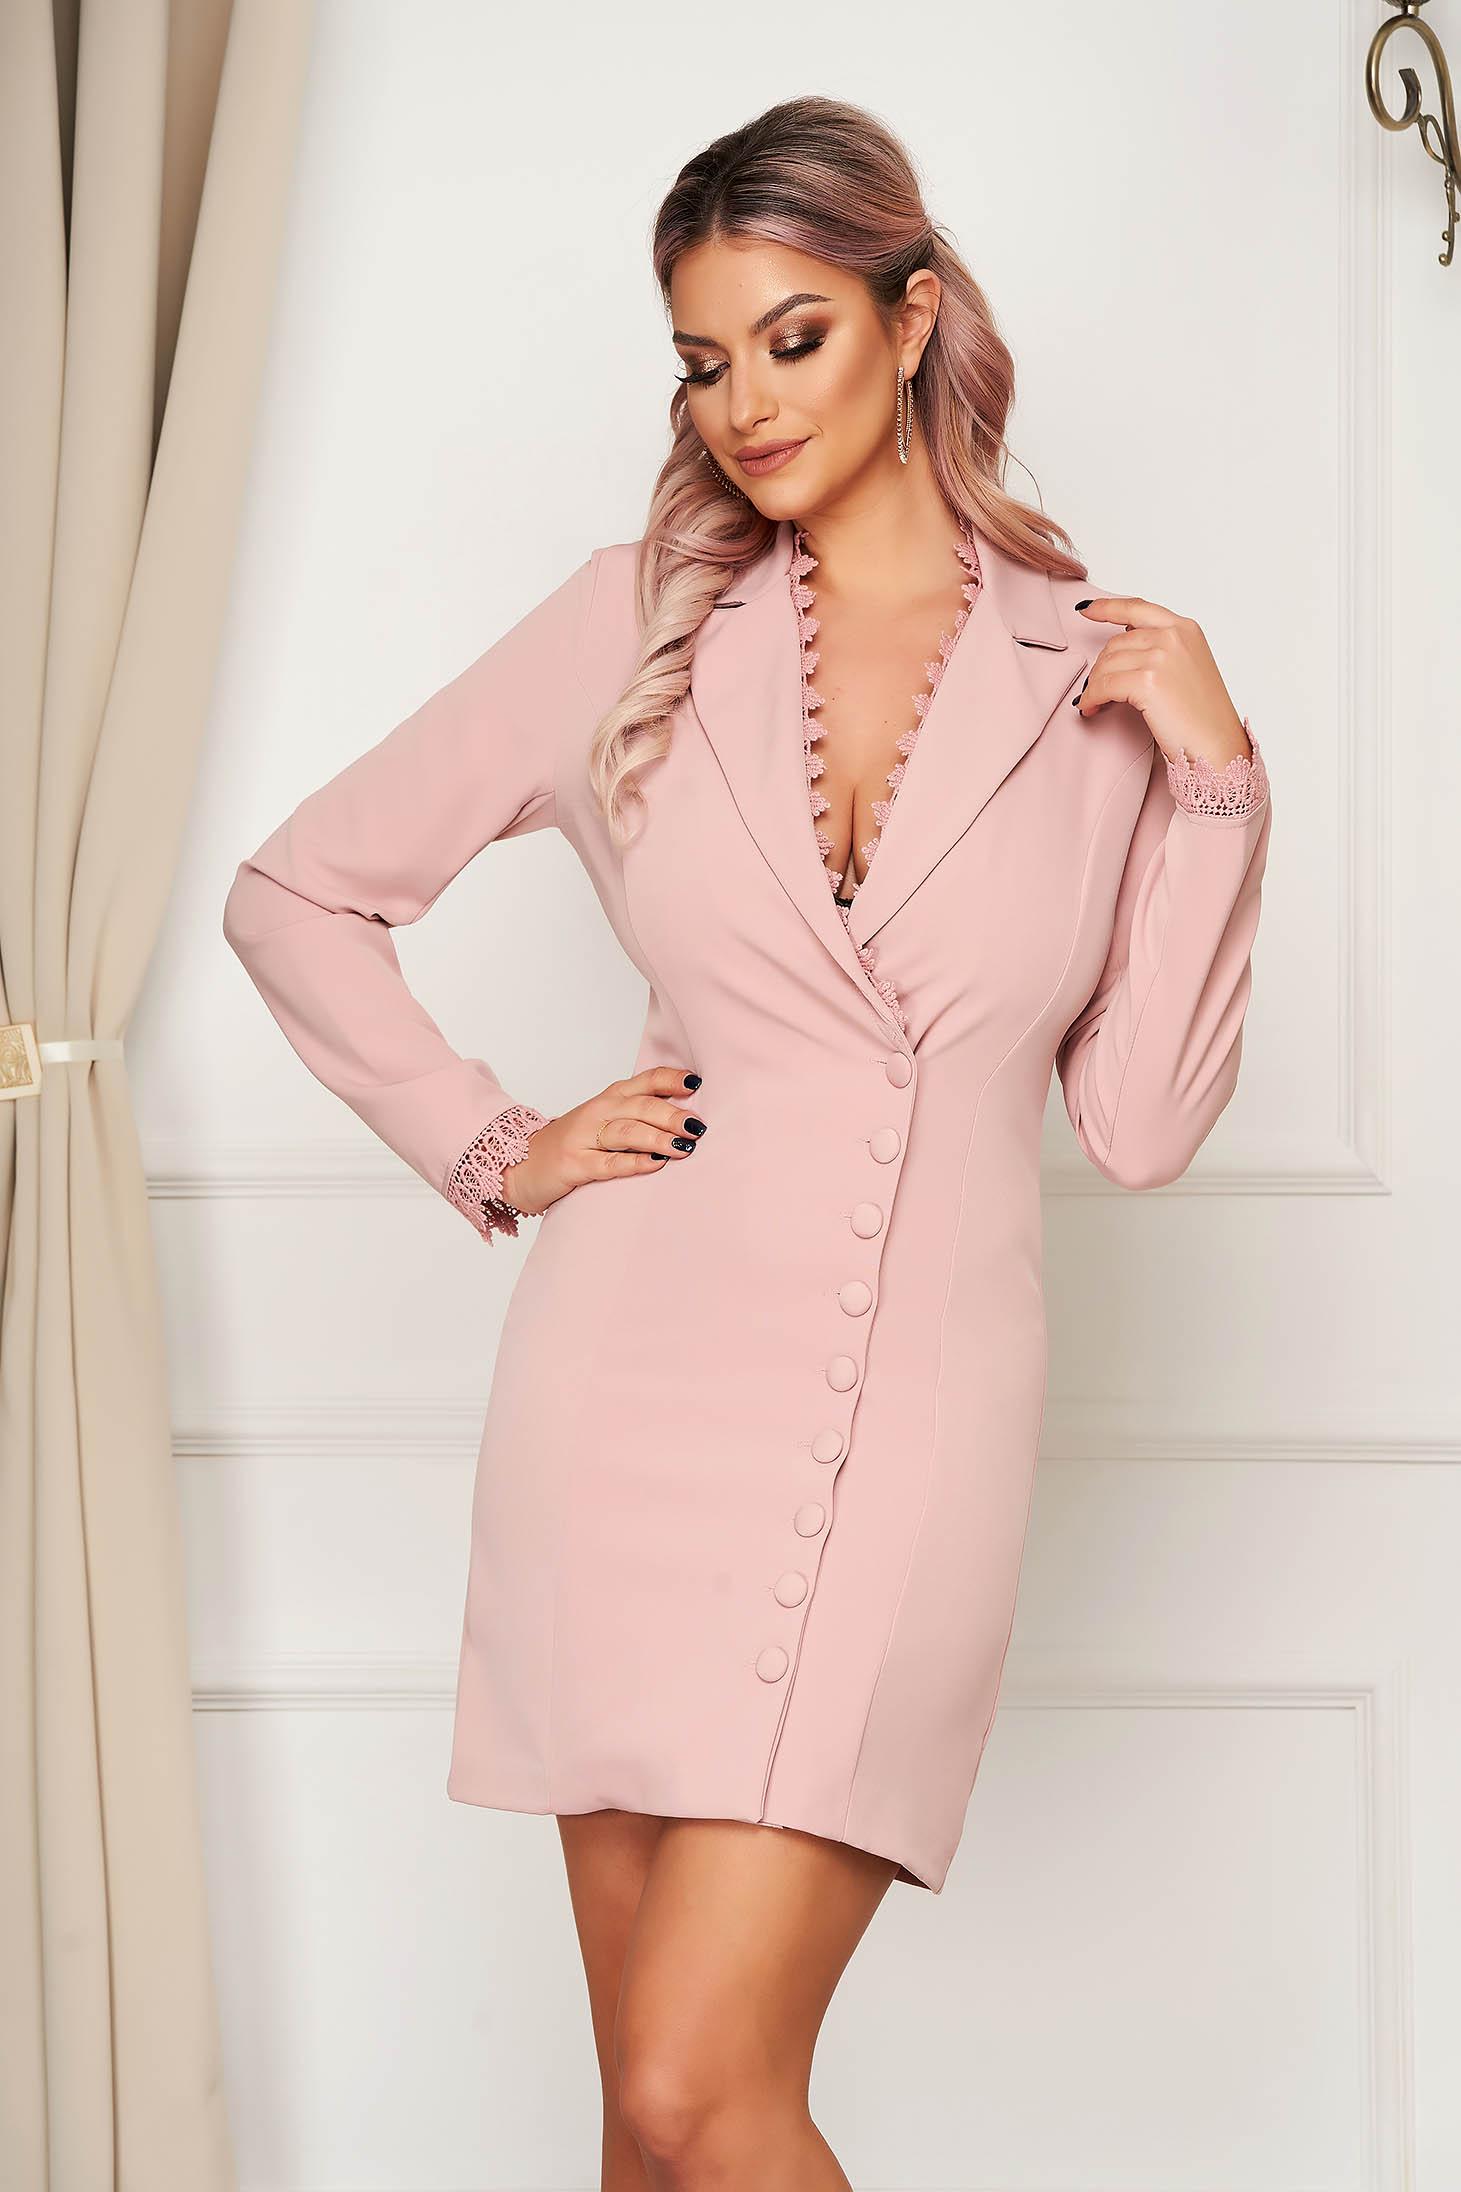 Rochie SunShine roz prafuit eleganta scurta din stofa tip sacou cu insertii de broderie